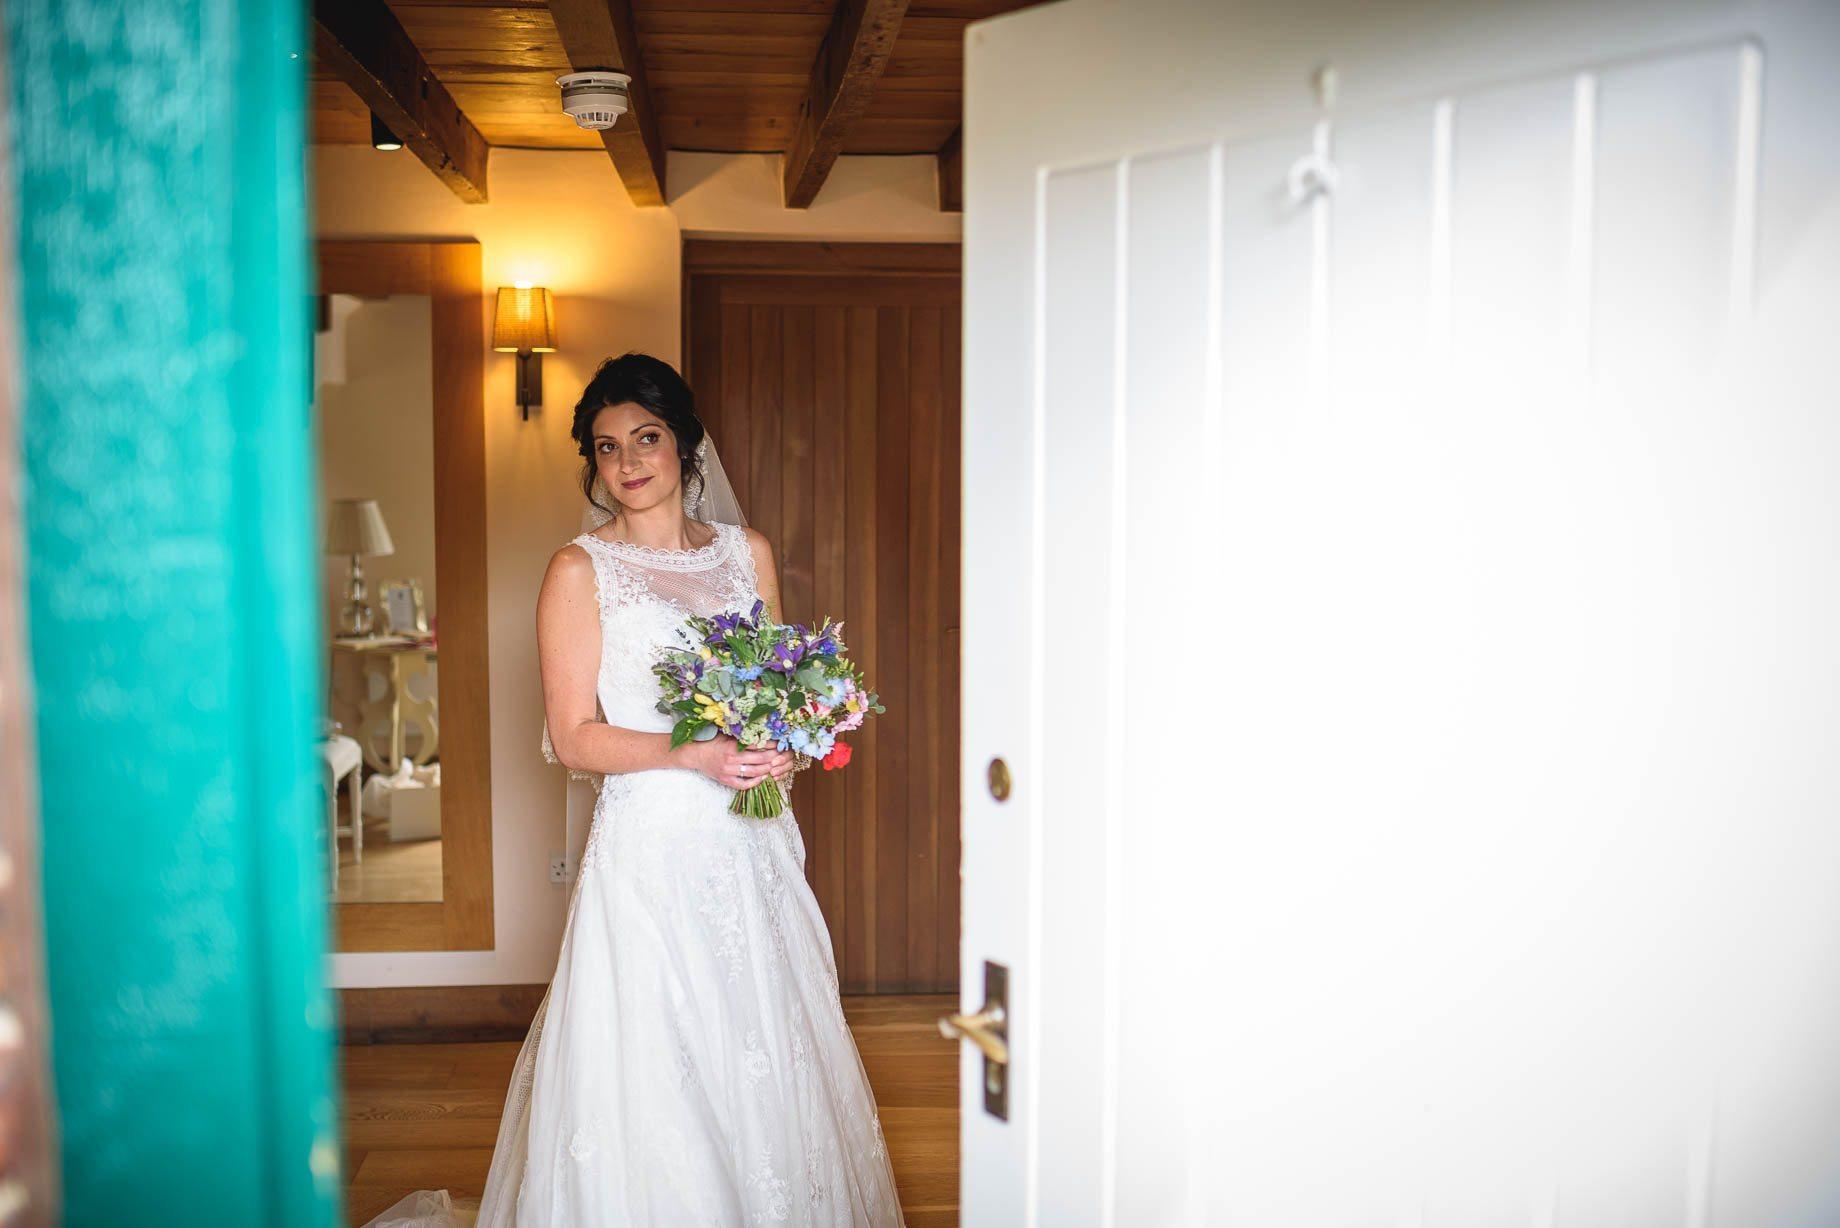 Gaynes Park wedding photography - Guy Collier Photography - Rachel and Jon (53 of 169)